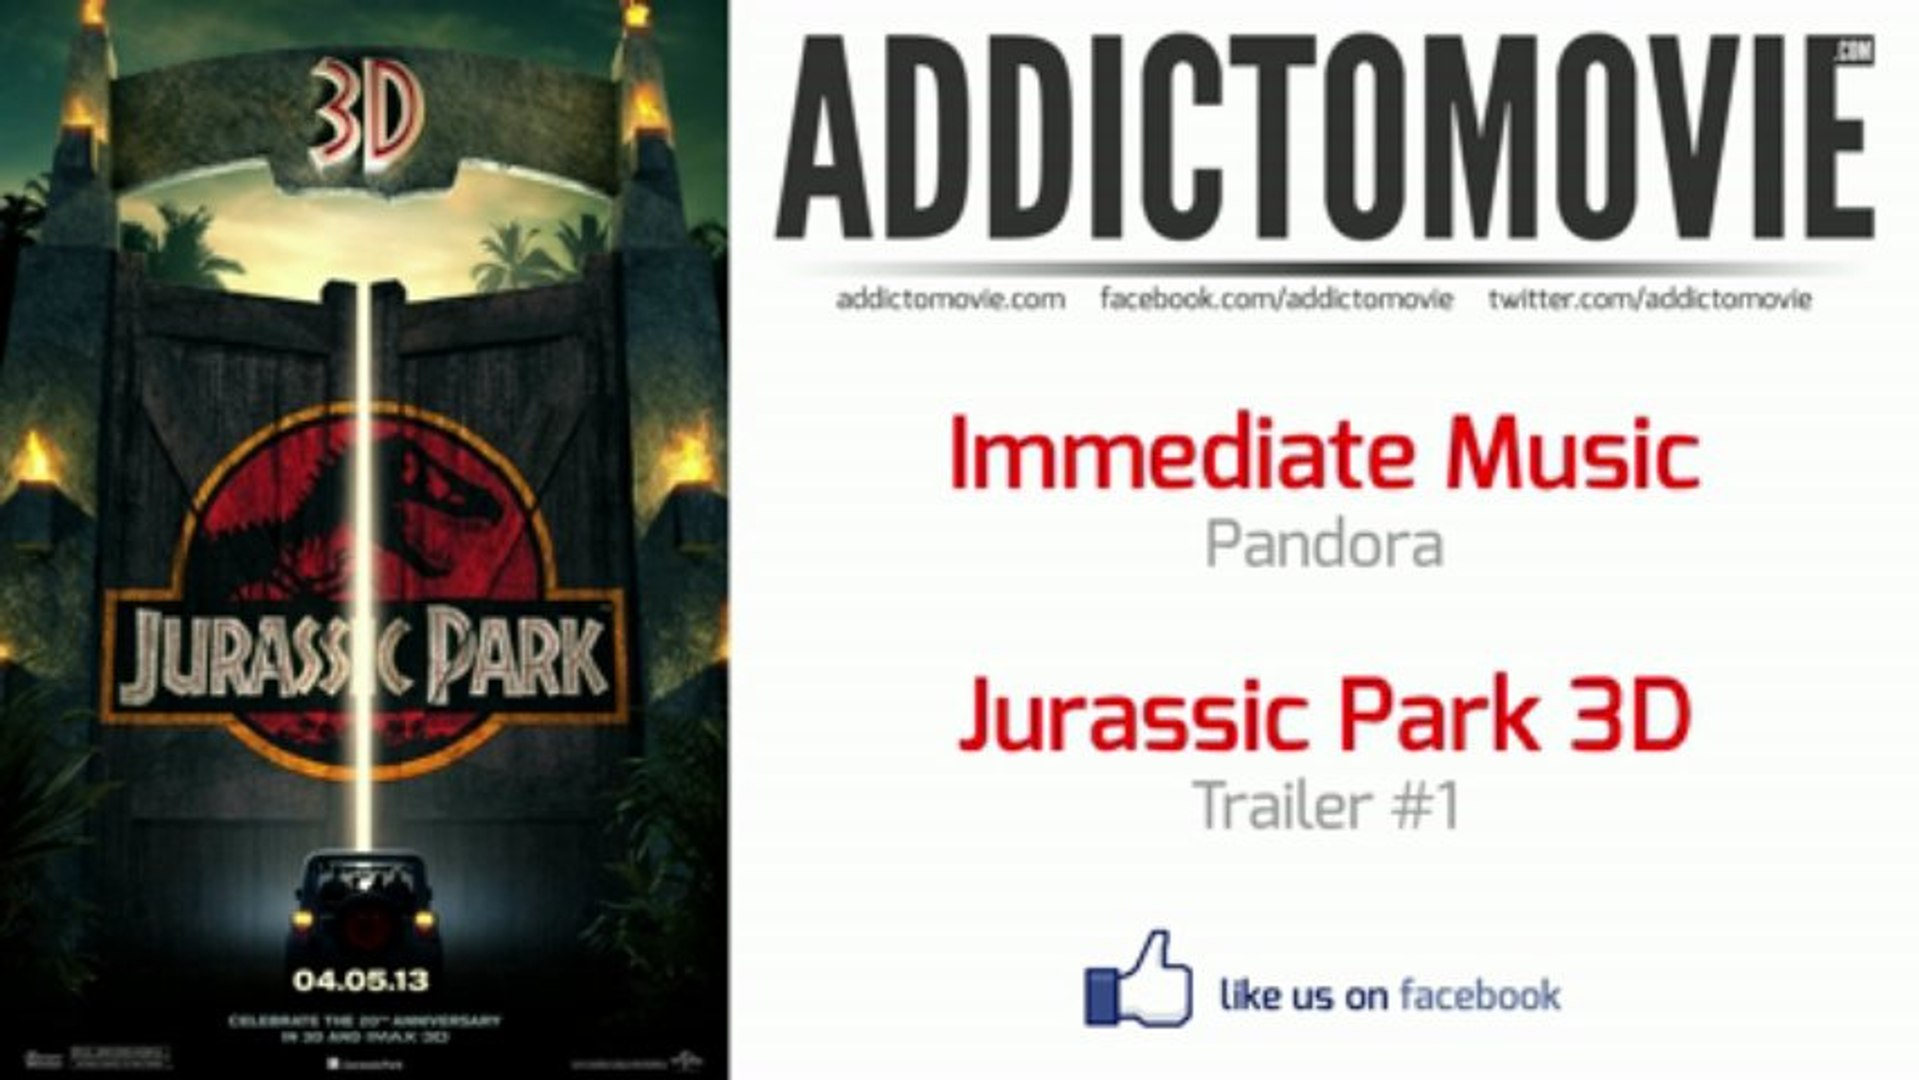 Jurassic Park 3D - Trailer #1 Music #2 (Immediate Music - Pandora)